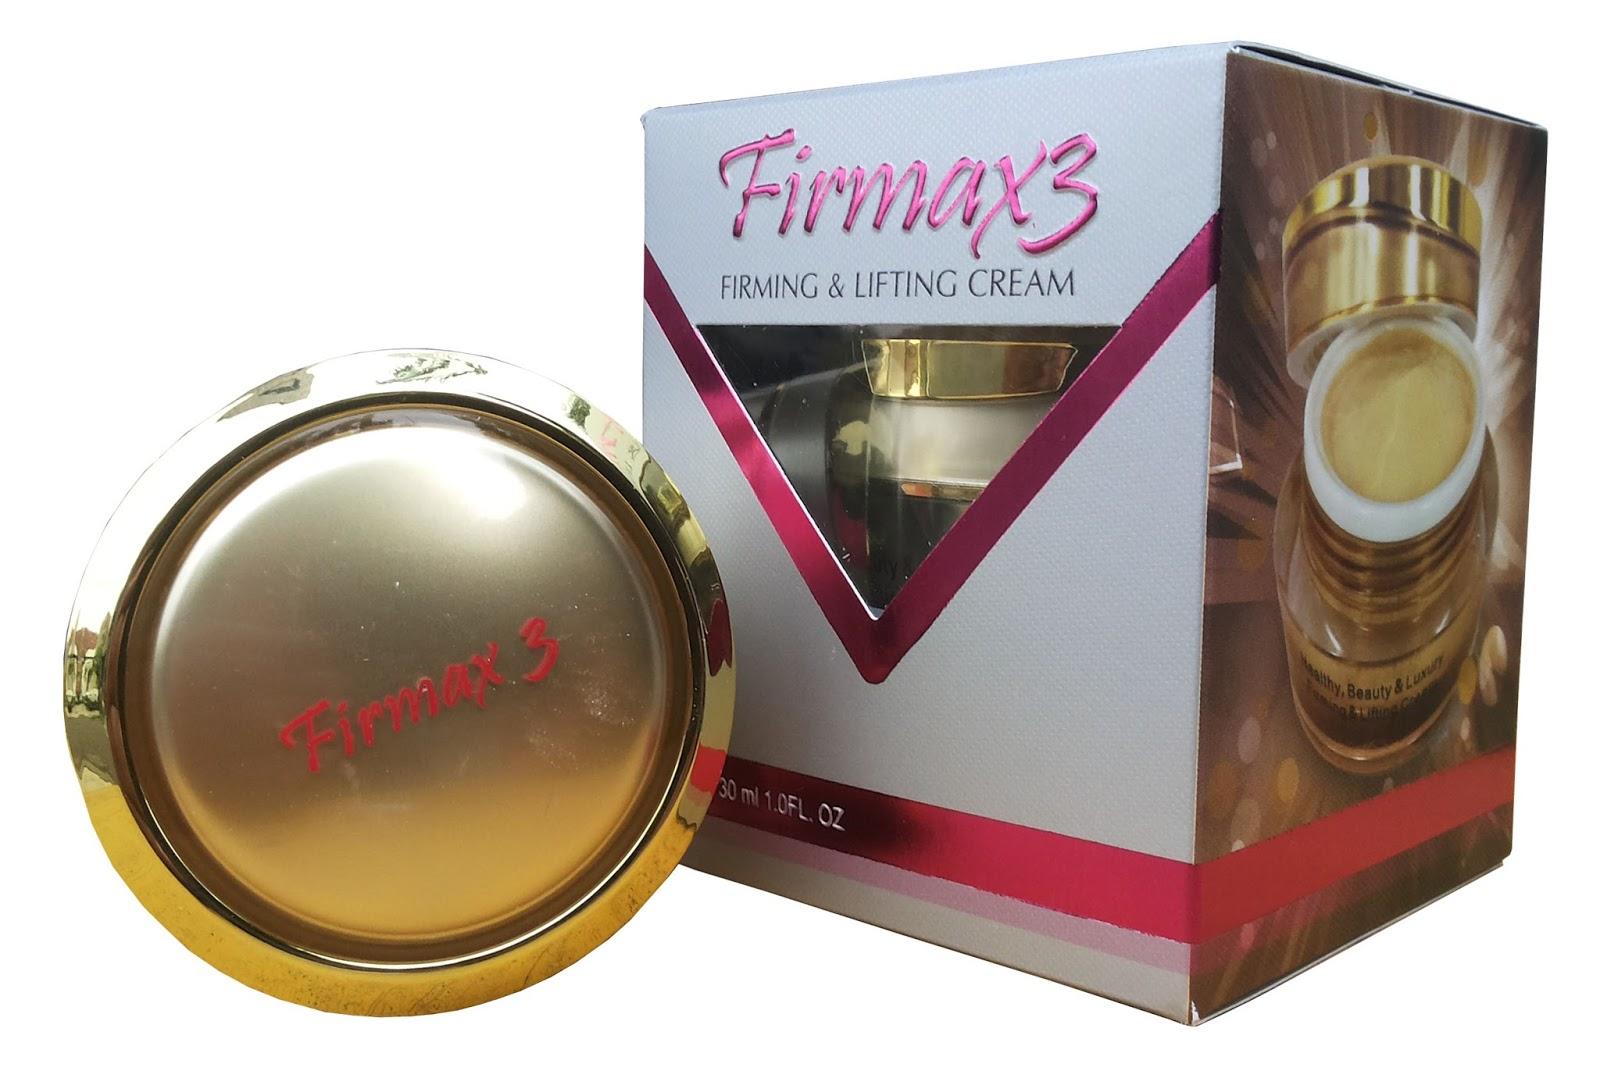 FIRMAX-3 FIRMING & LIFTING CREAM INDONESIA TERMURAH